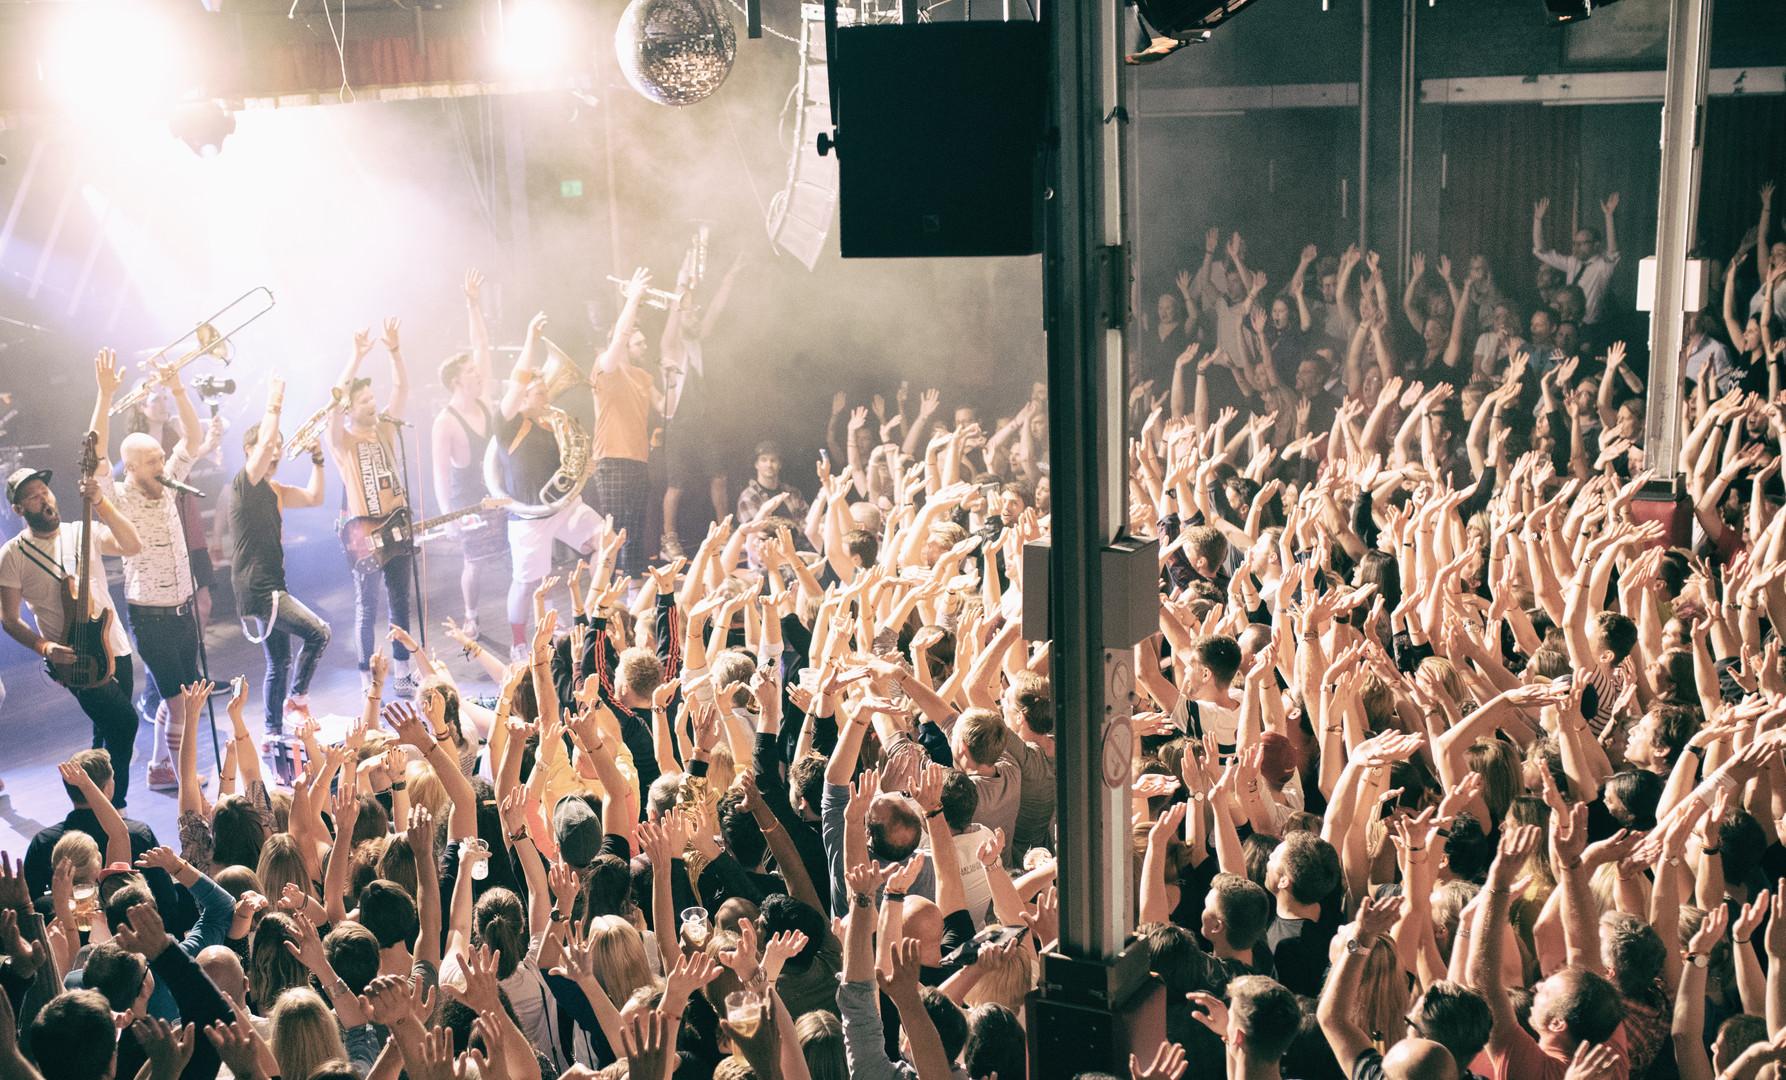 QB Tour Mai @Festsaal Kreuzberg Berlin